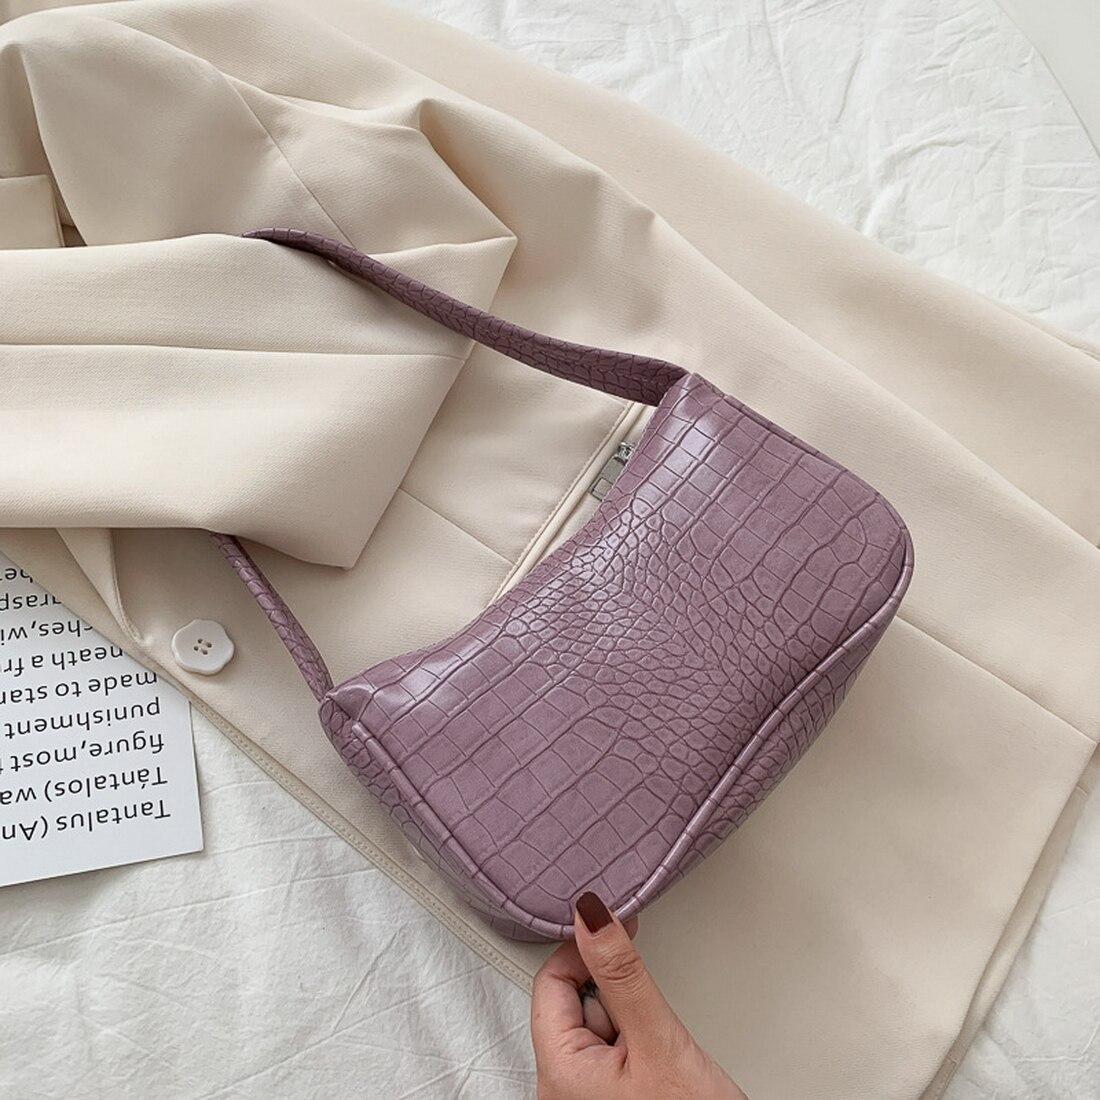 Soft Pu Leather Women Purple Underarm Bag Retro Solid Color Ladies Handbags Fashion Design Girls Small Shoulder Bags Mega Sale 8f99c Cicig